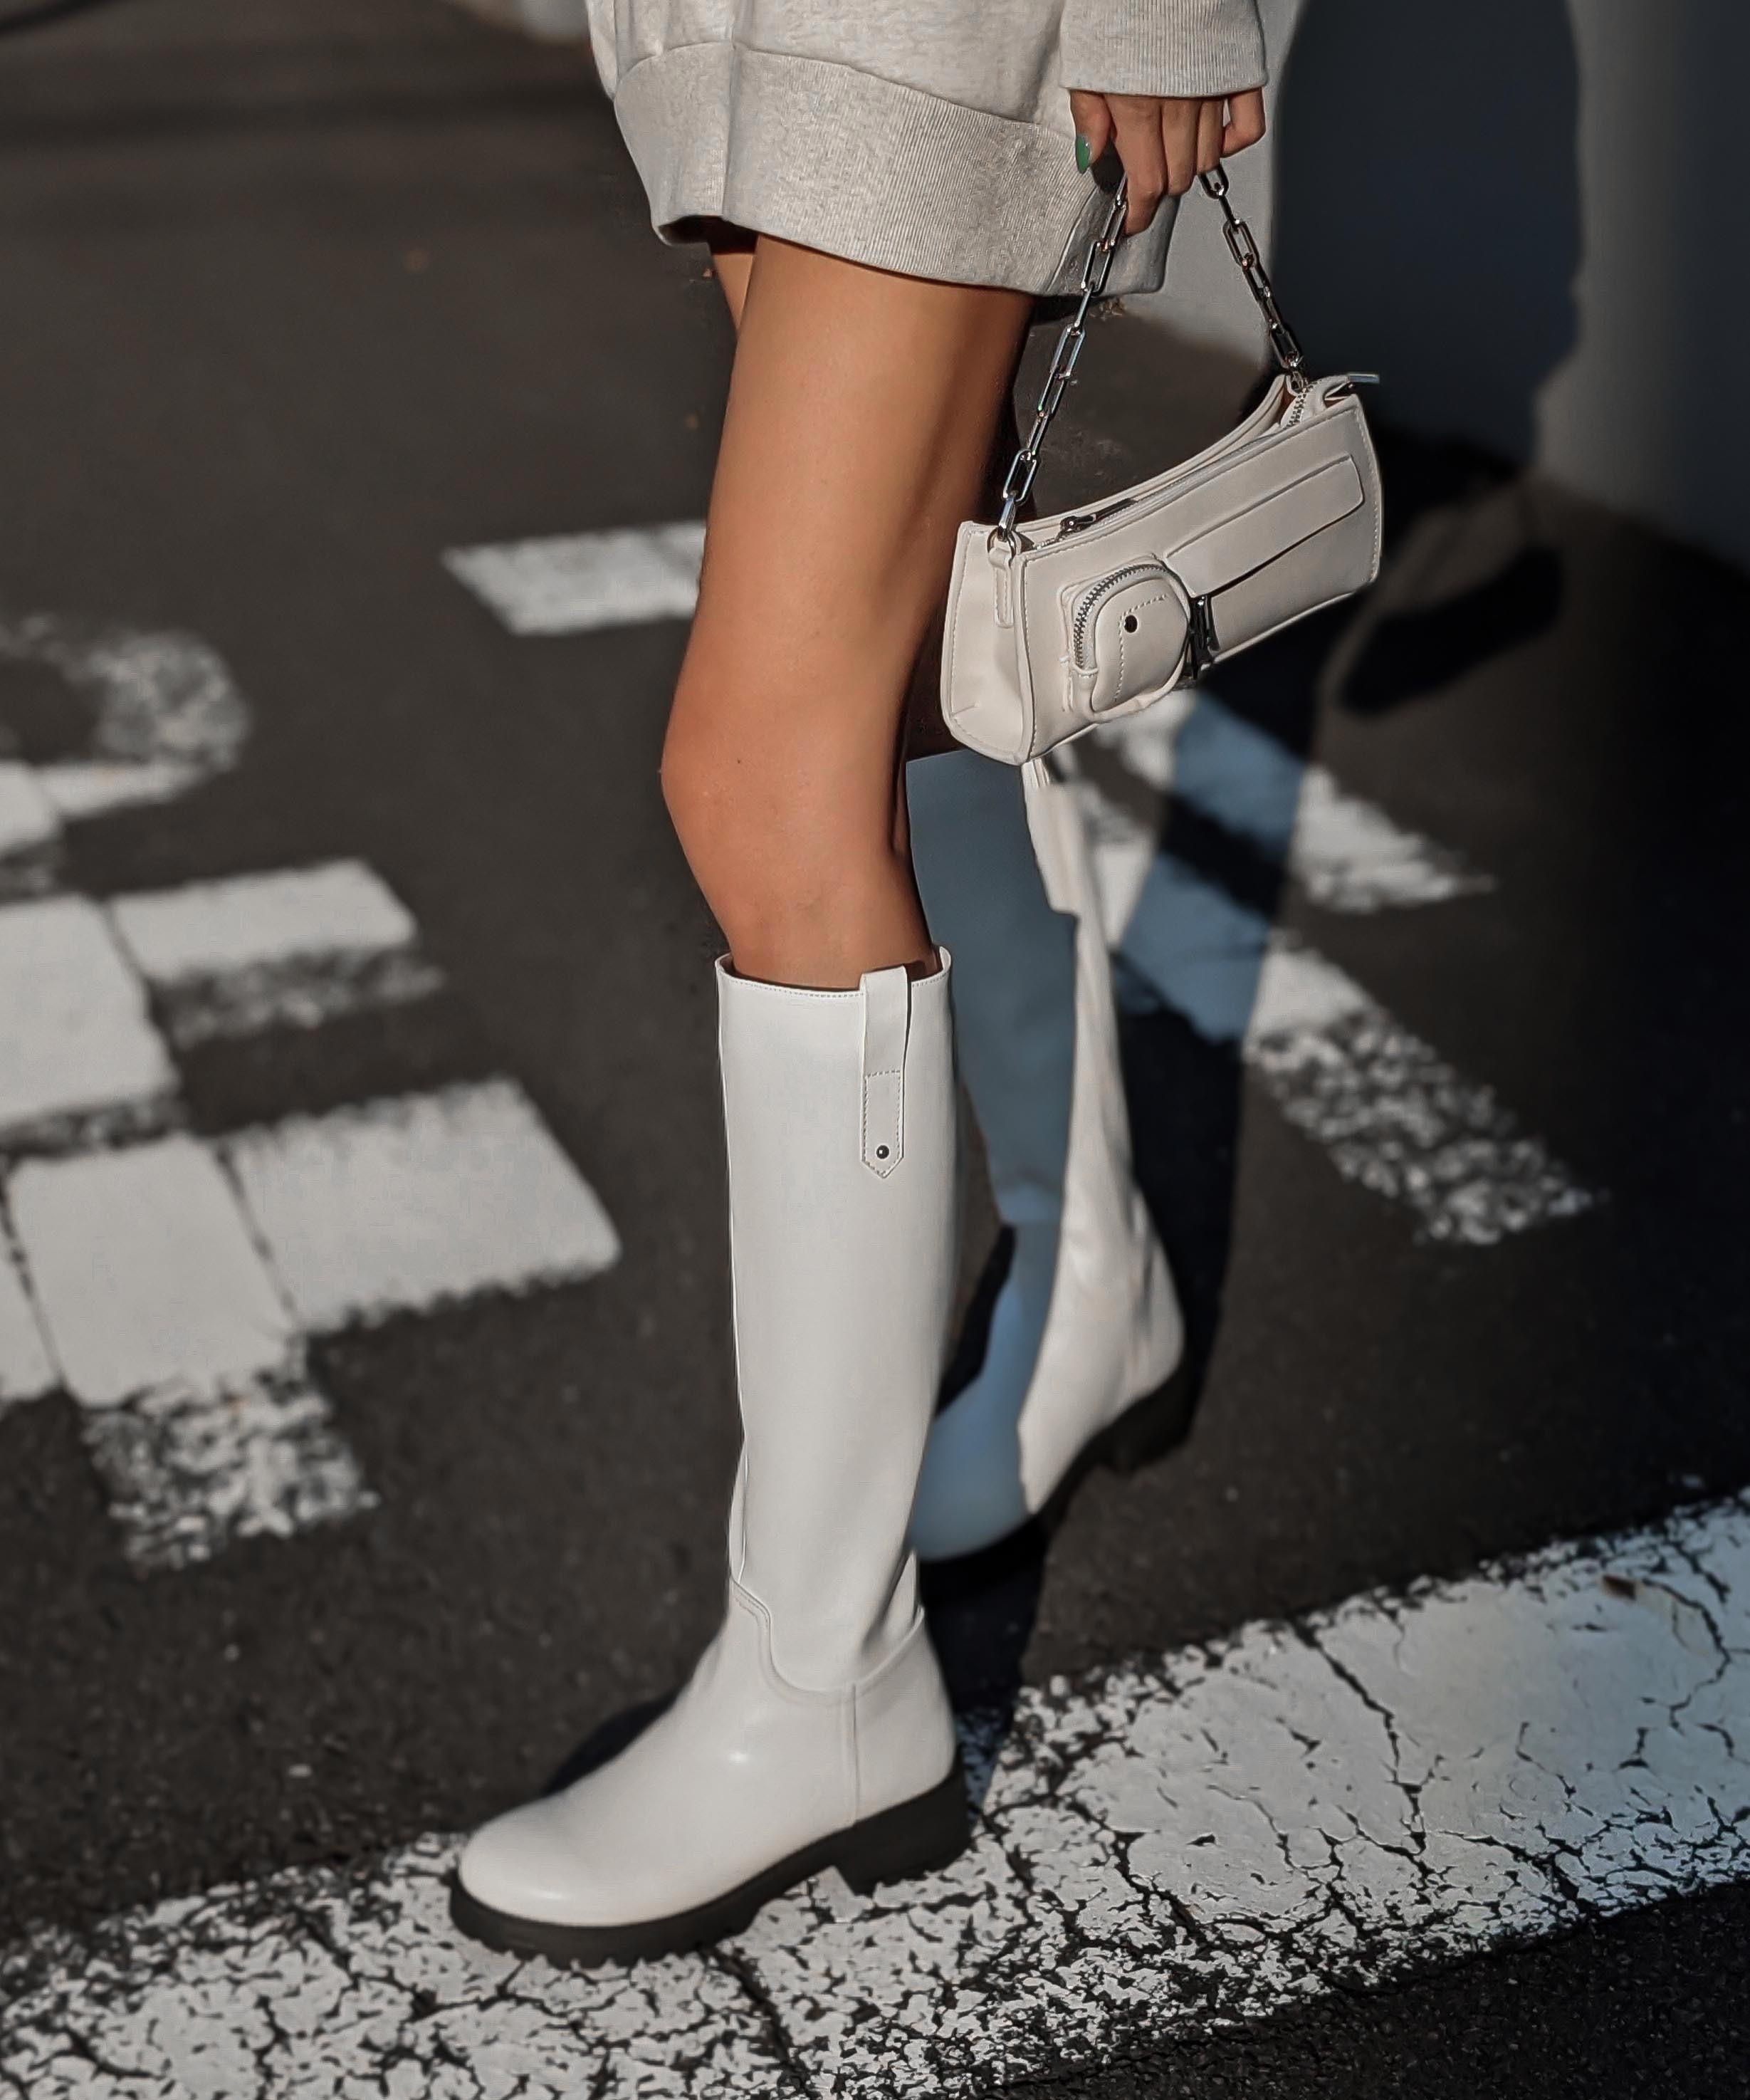 Lug sole long boots